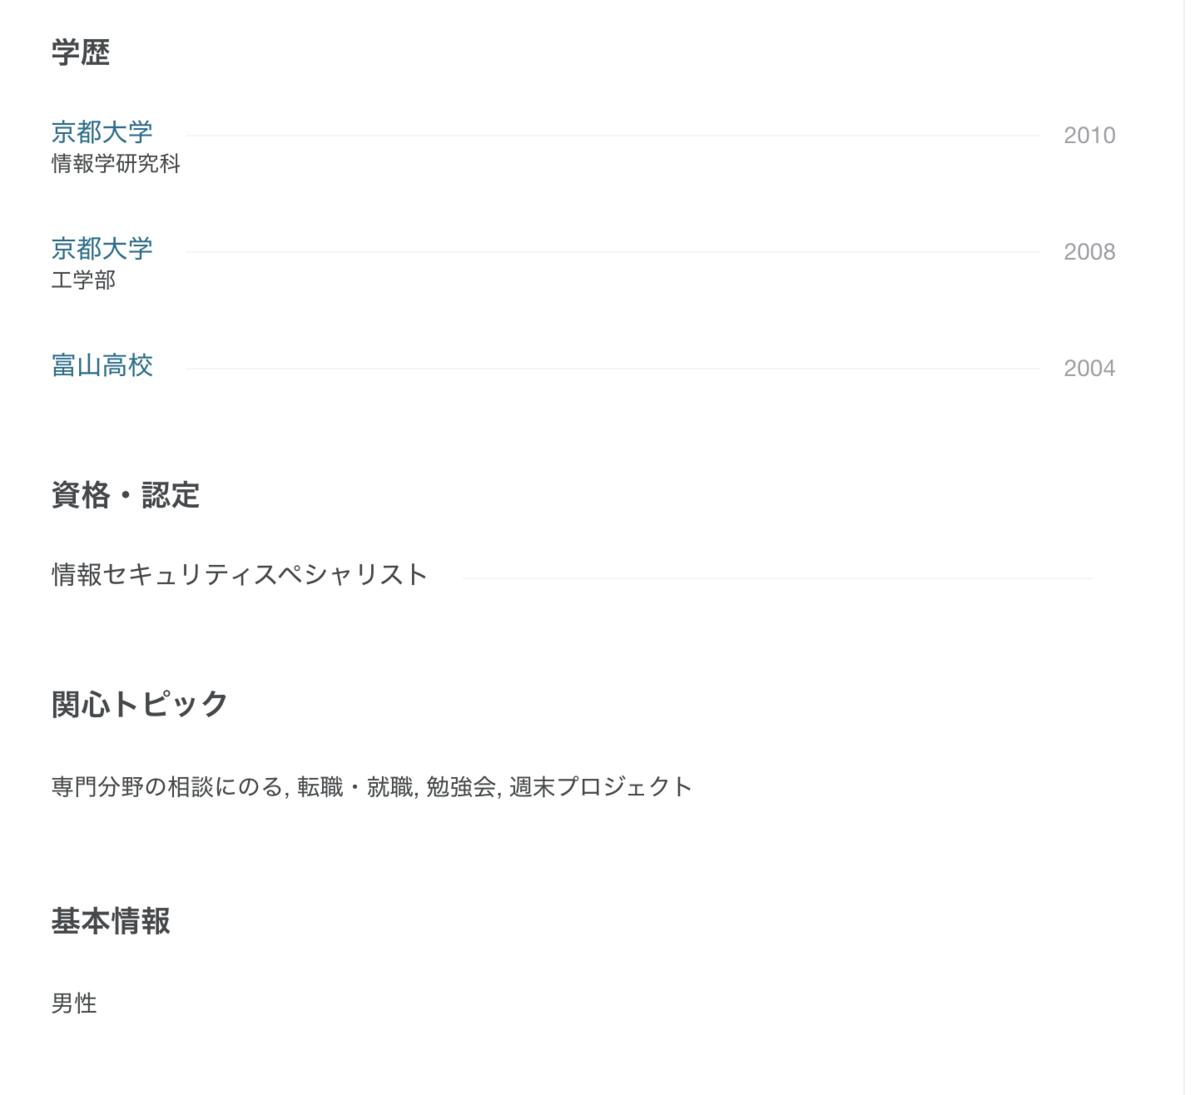 f:id:YusukeIwaki:20200802224943p:plain